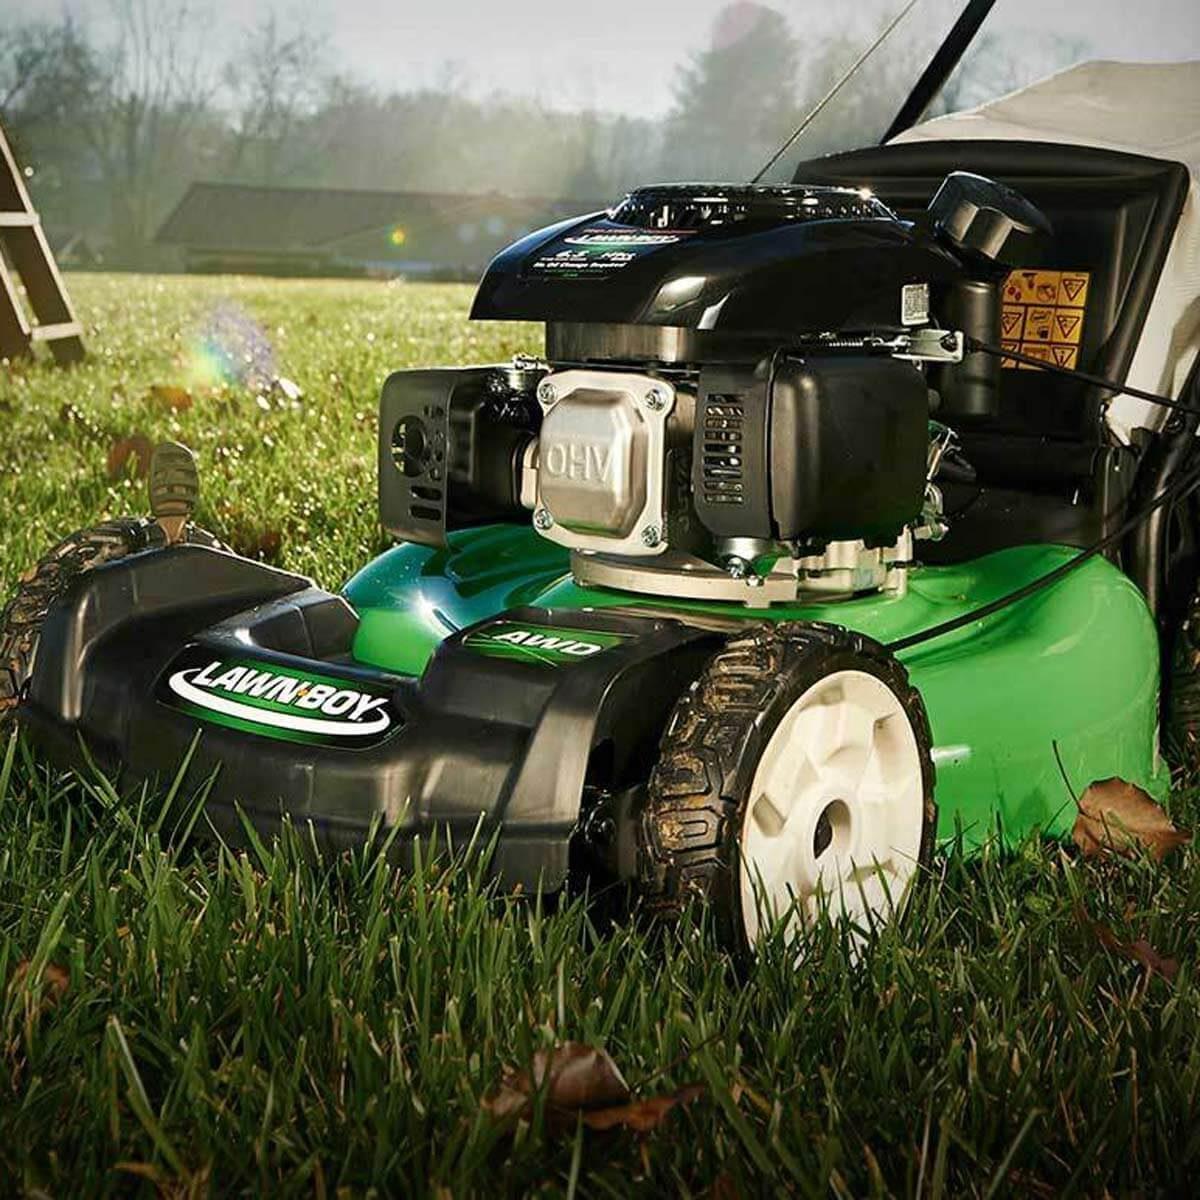 dfh7_lawn-boy lawn mower